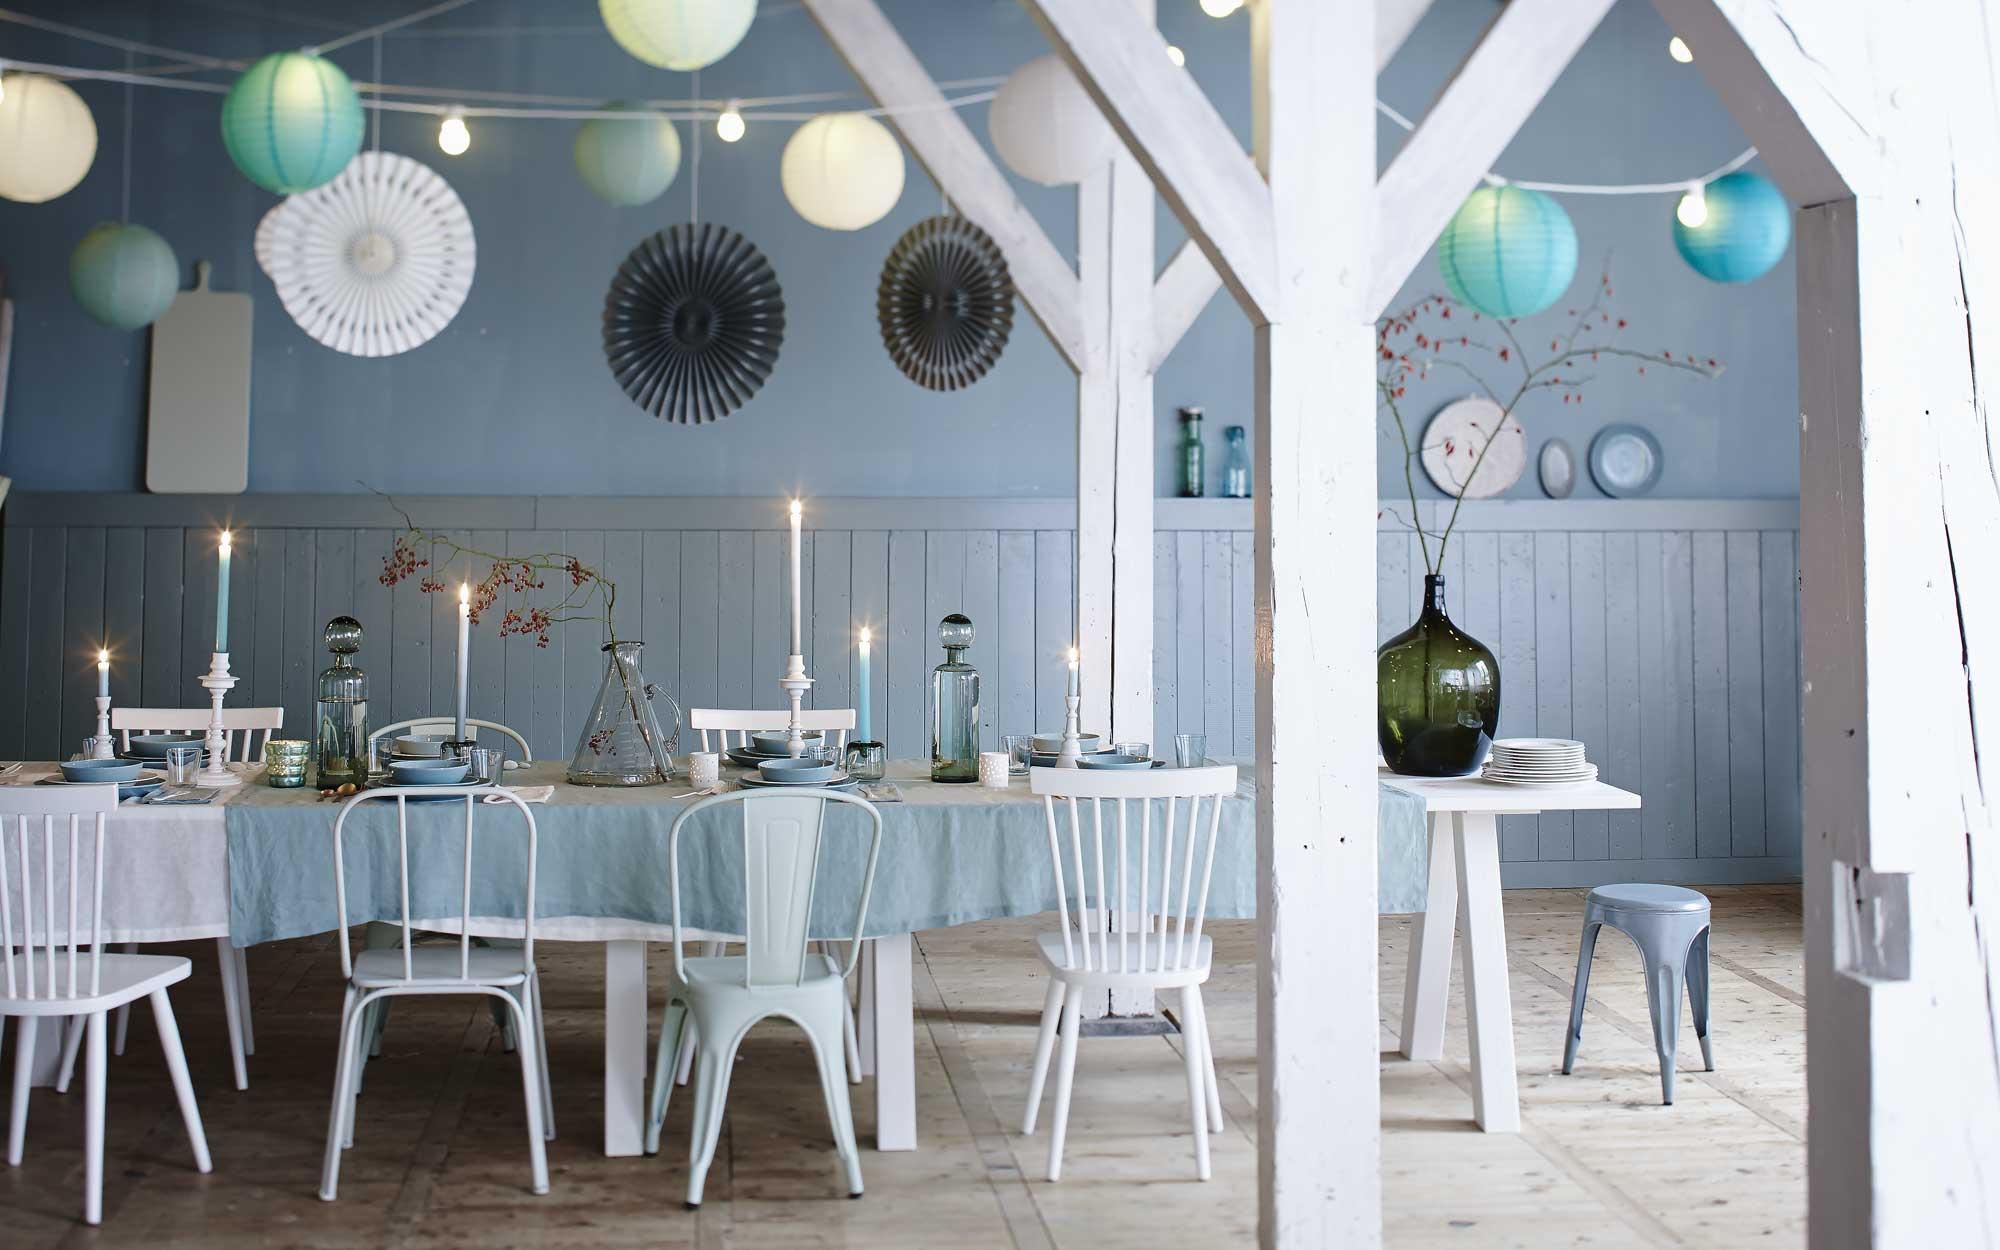 kerst-tafel-lampen-stoelen